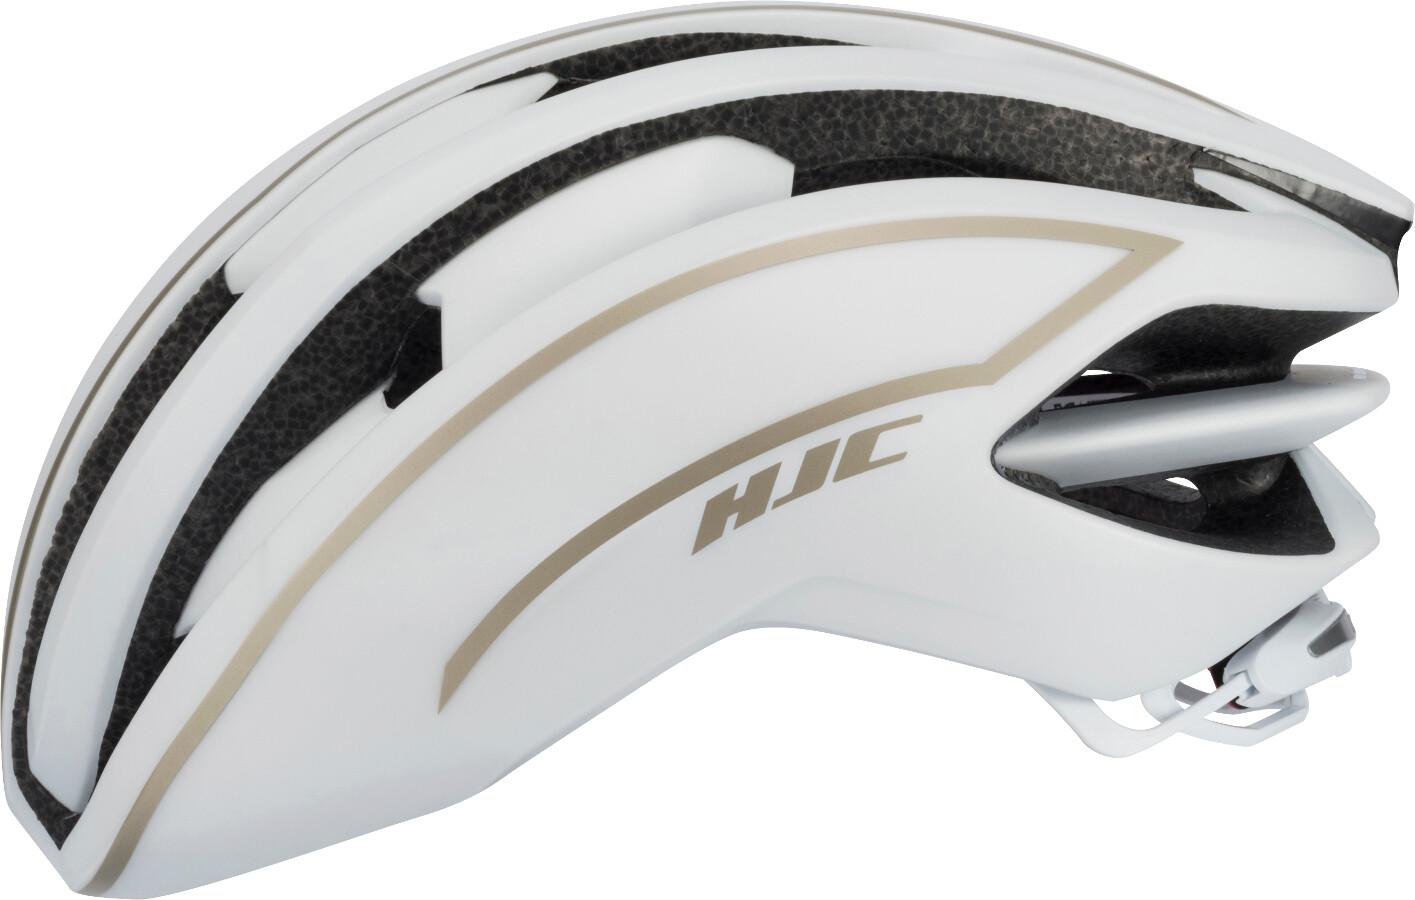 HJC IBEX Road Cykelhjelm, matt white / gold | Hjelme